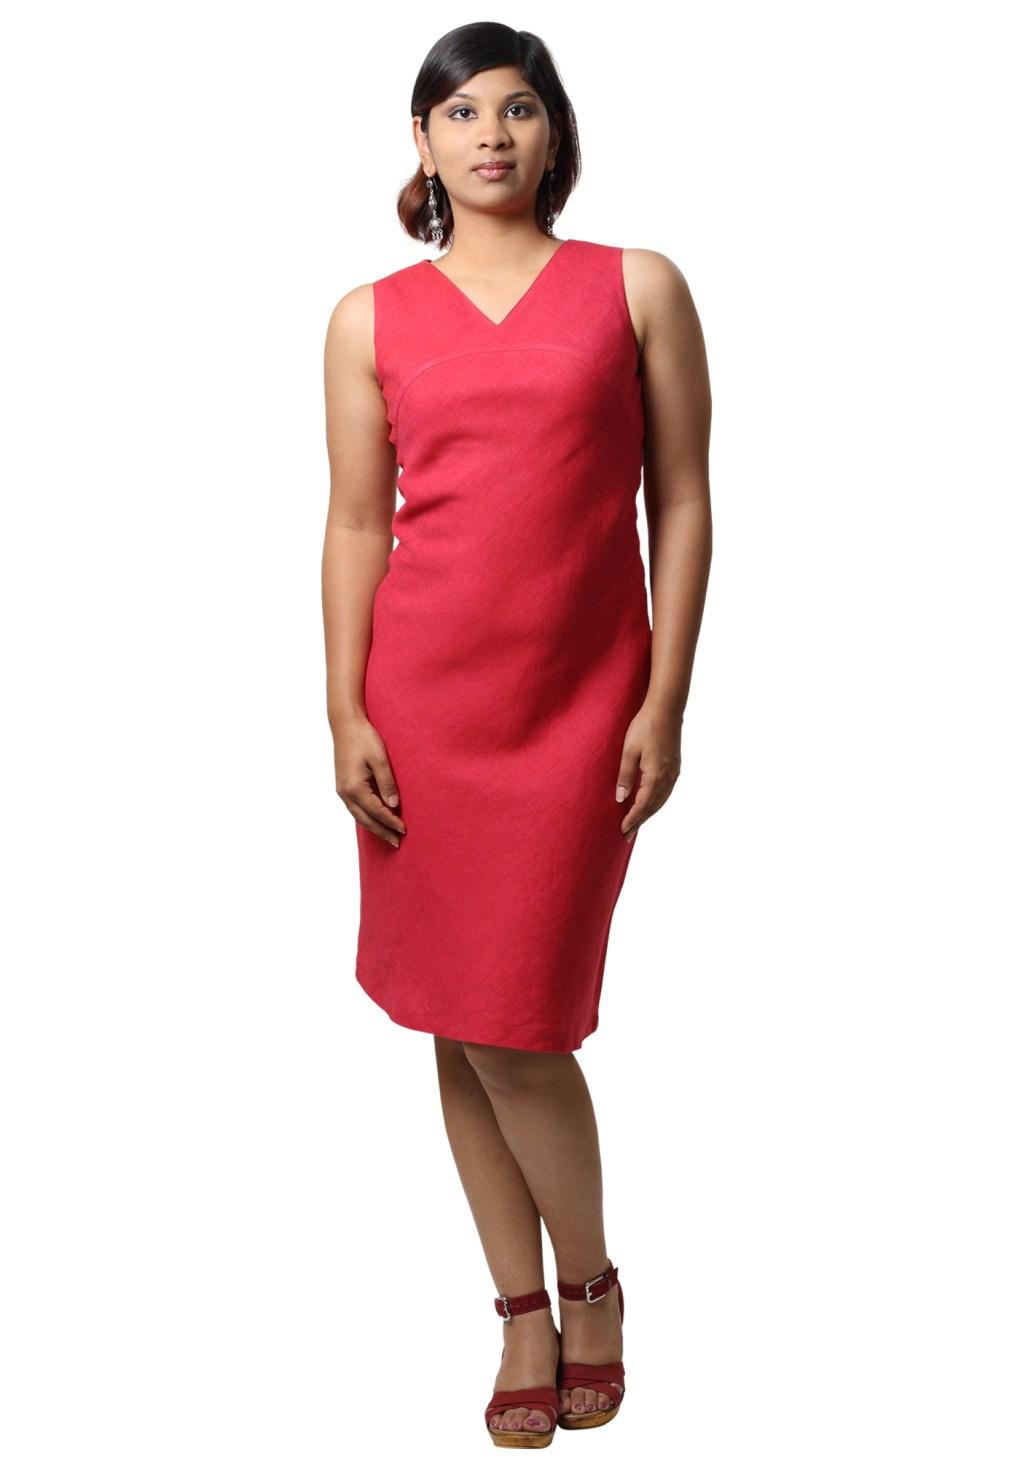 MINC Pamela Short Dress In Fuchsia Linen